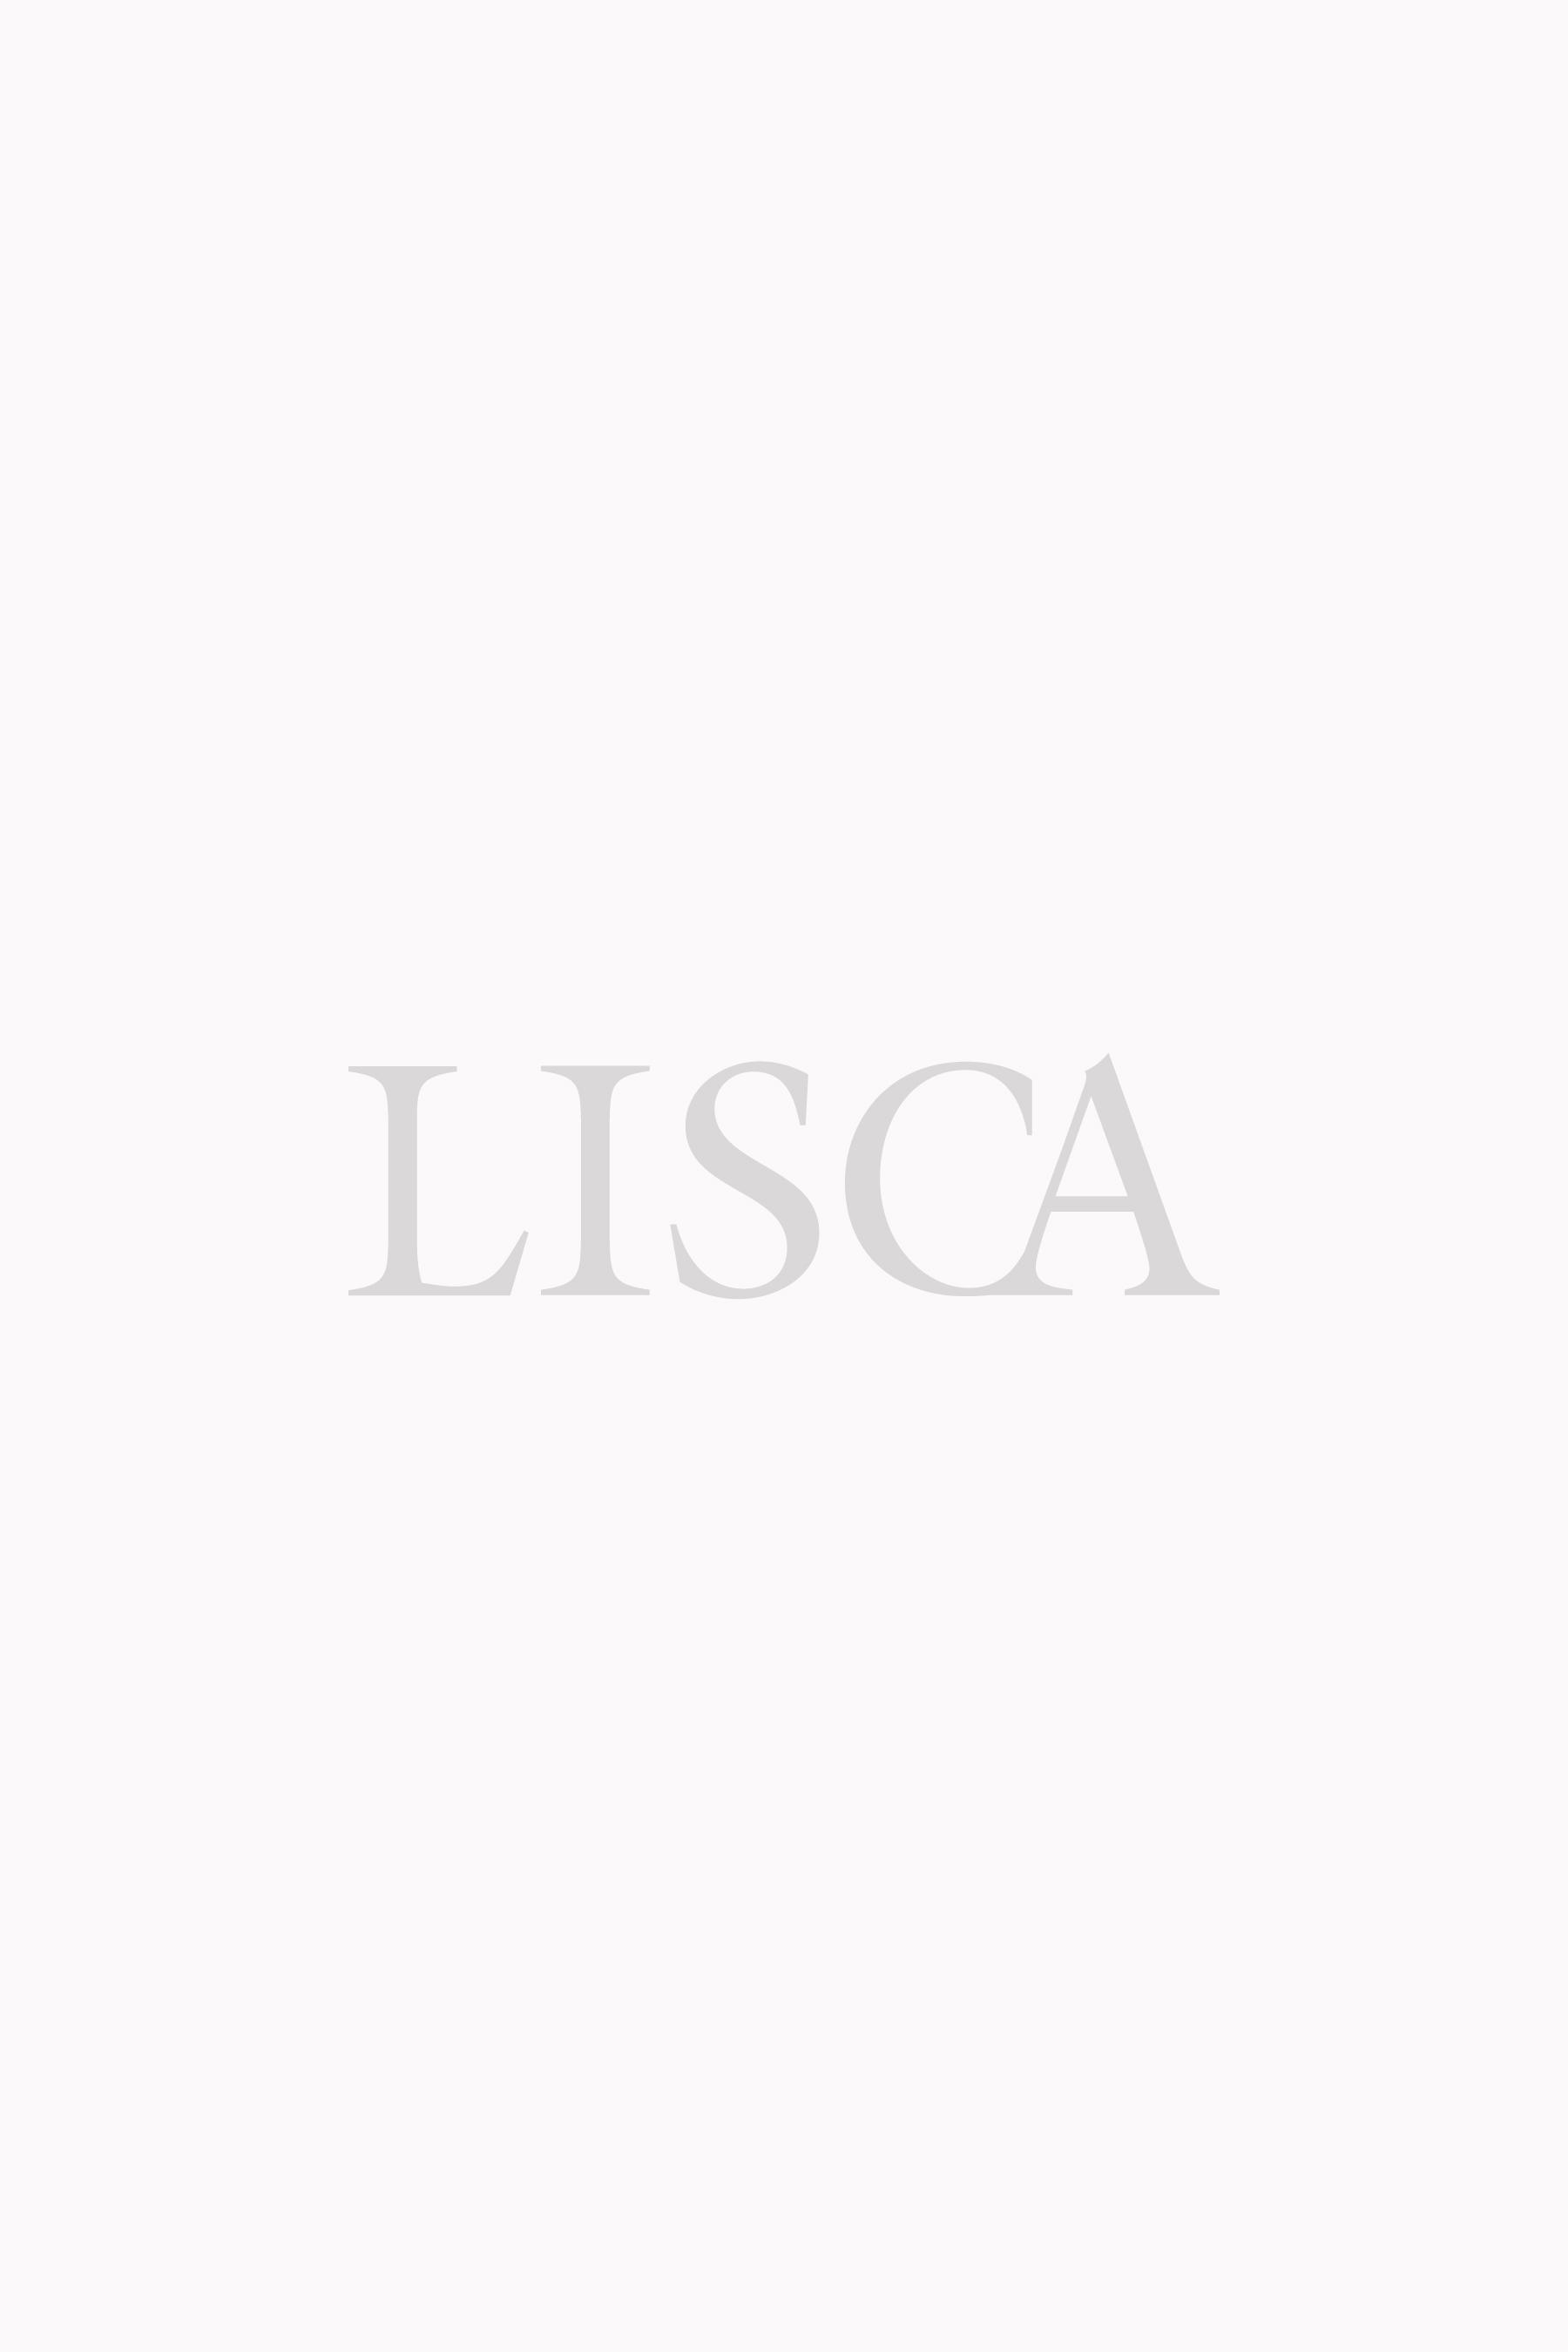 Brazil гаќички »Fiona«